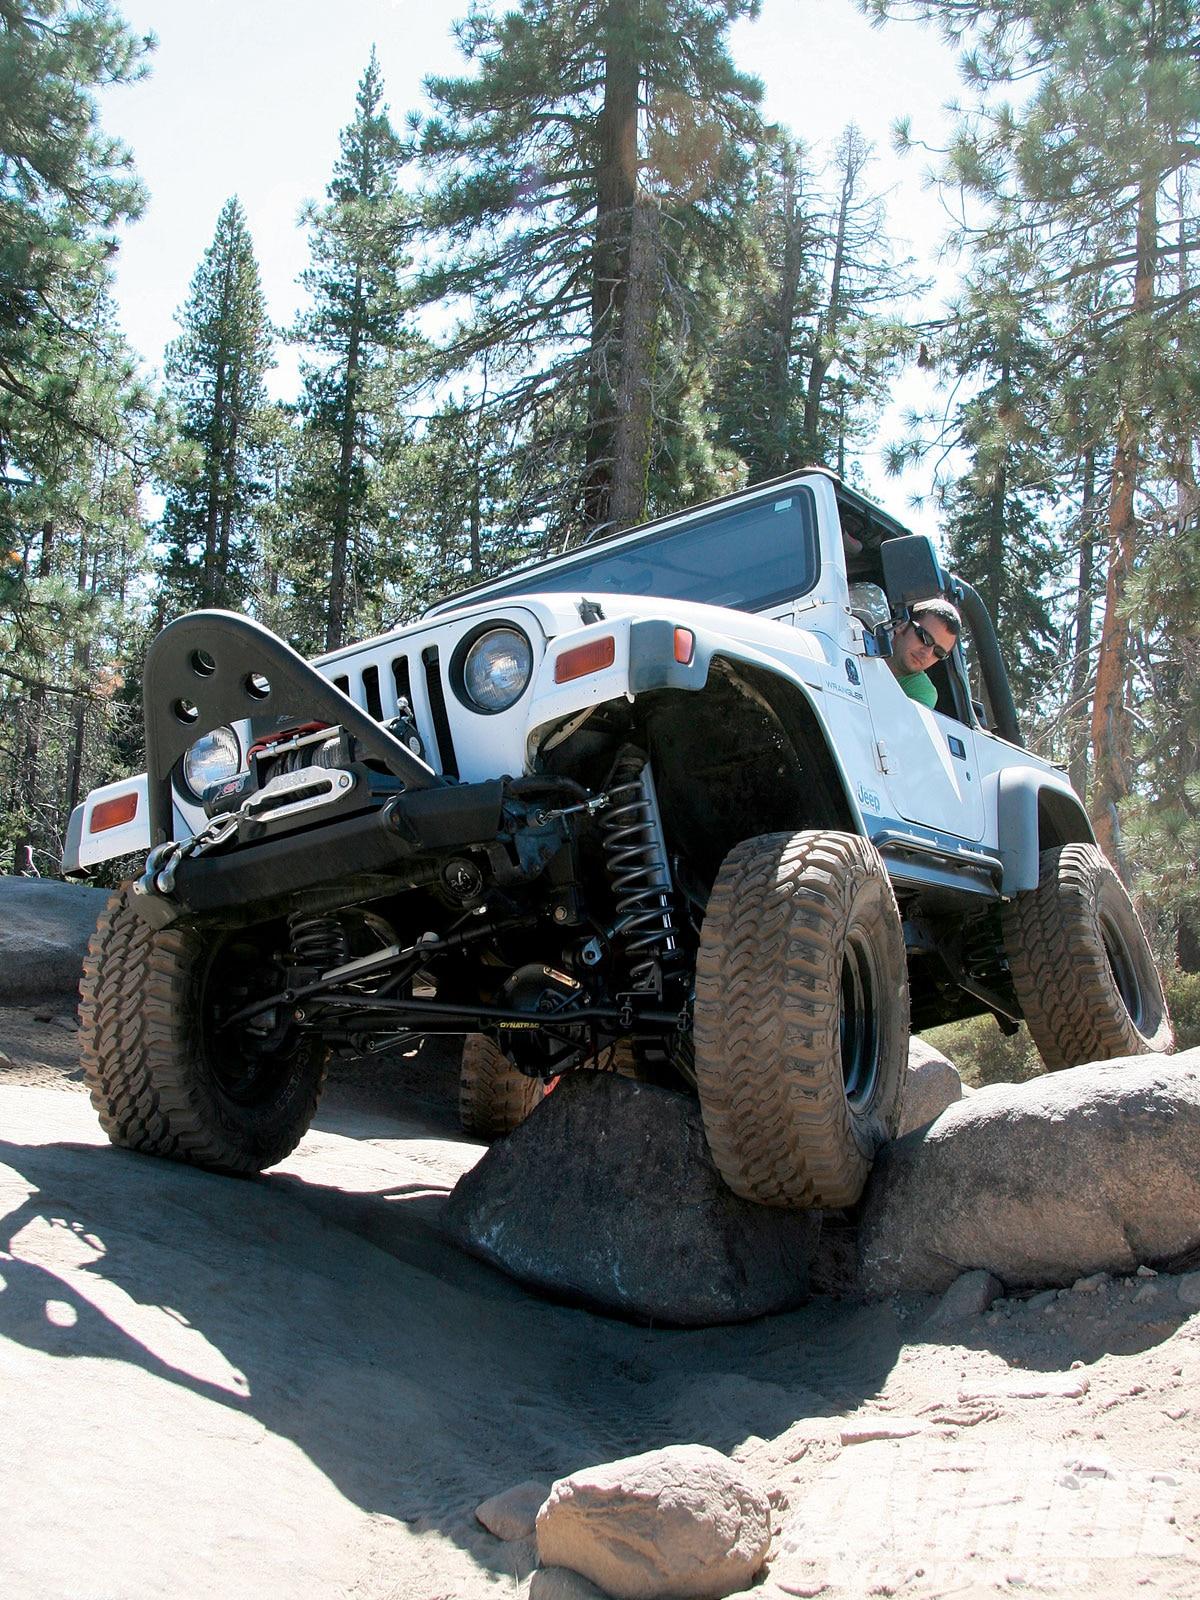 1997 jeep wrangler suspension lift - rock crawling - photo 01